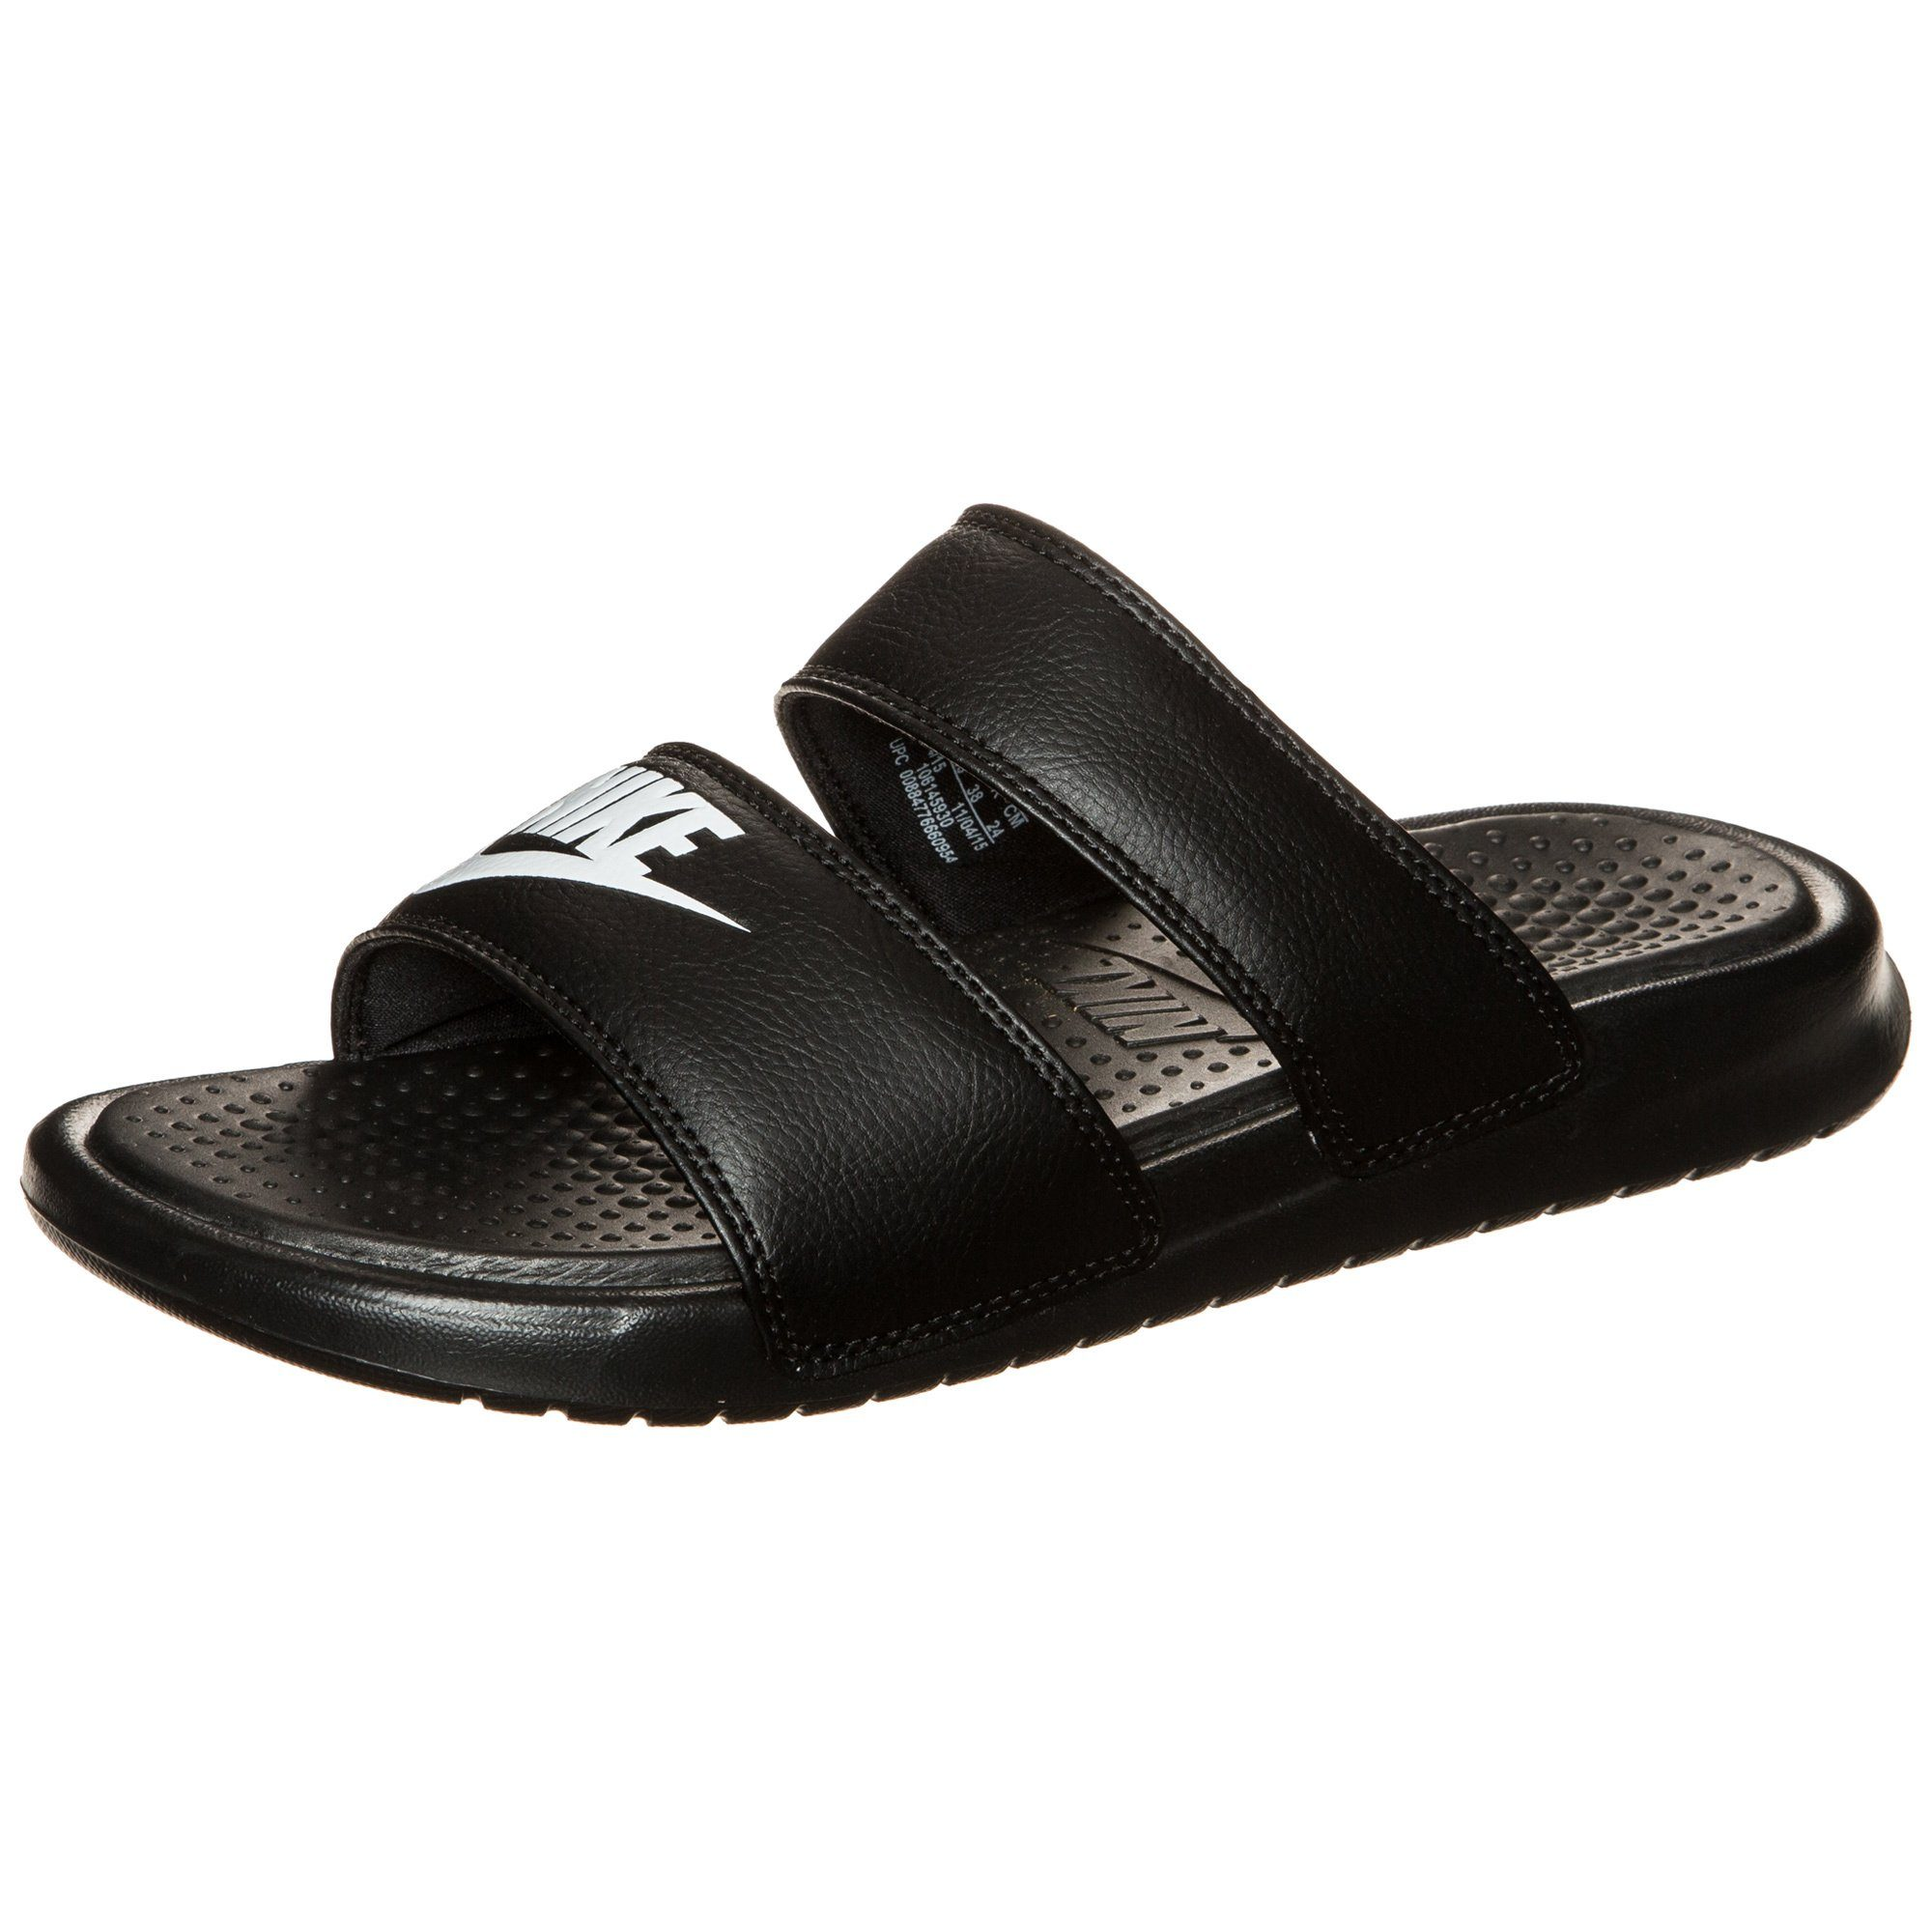 Nike Sportswear Benassi Duo Ultra Slide Badesandale Damen online kaufen  schwarz #ft5_slash# weiß